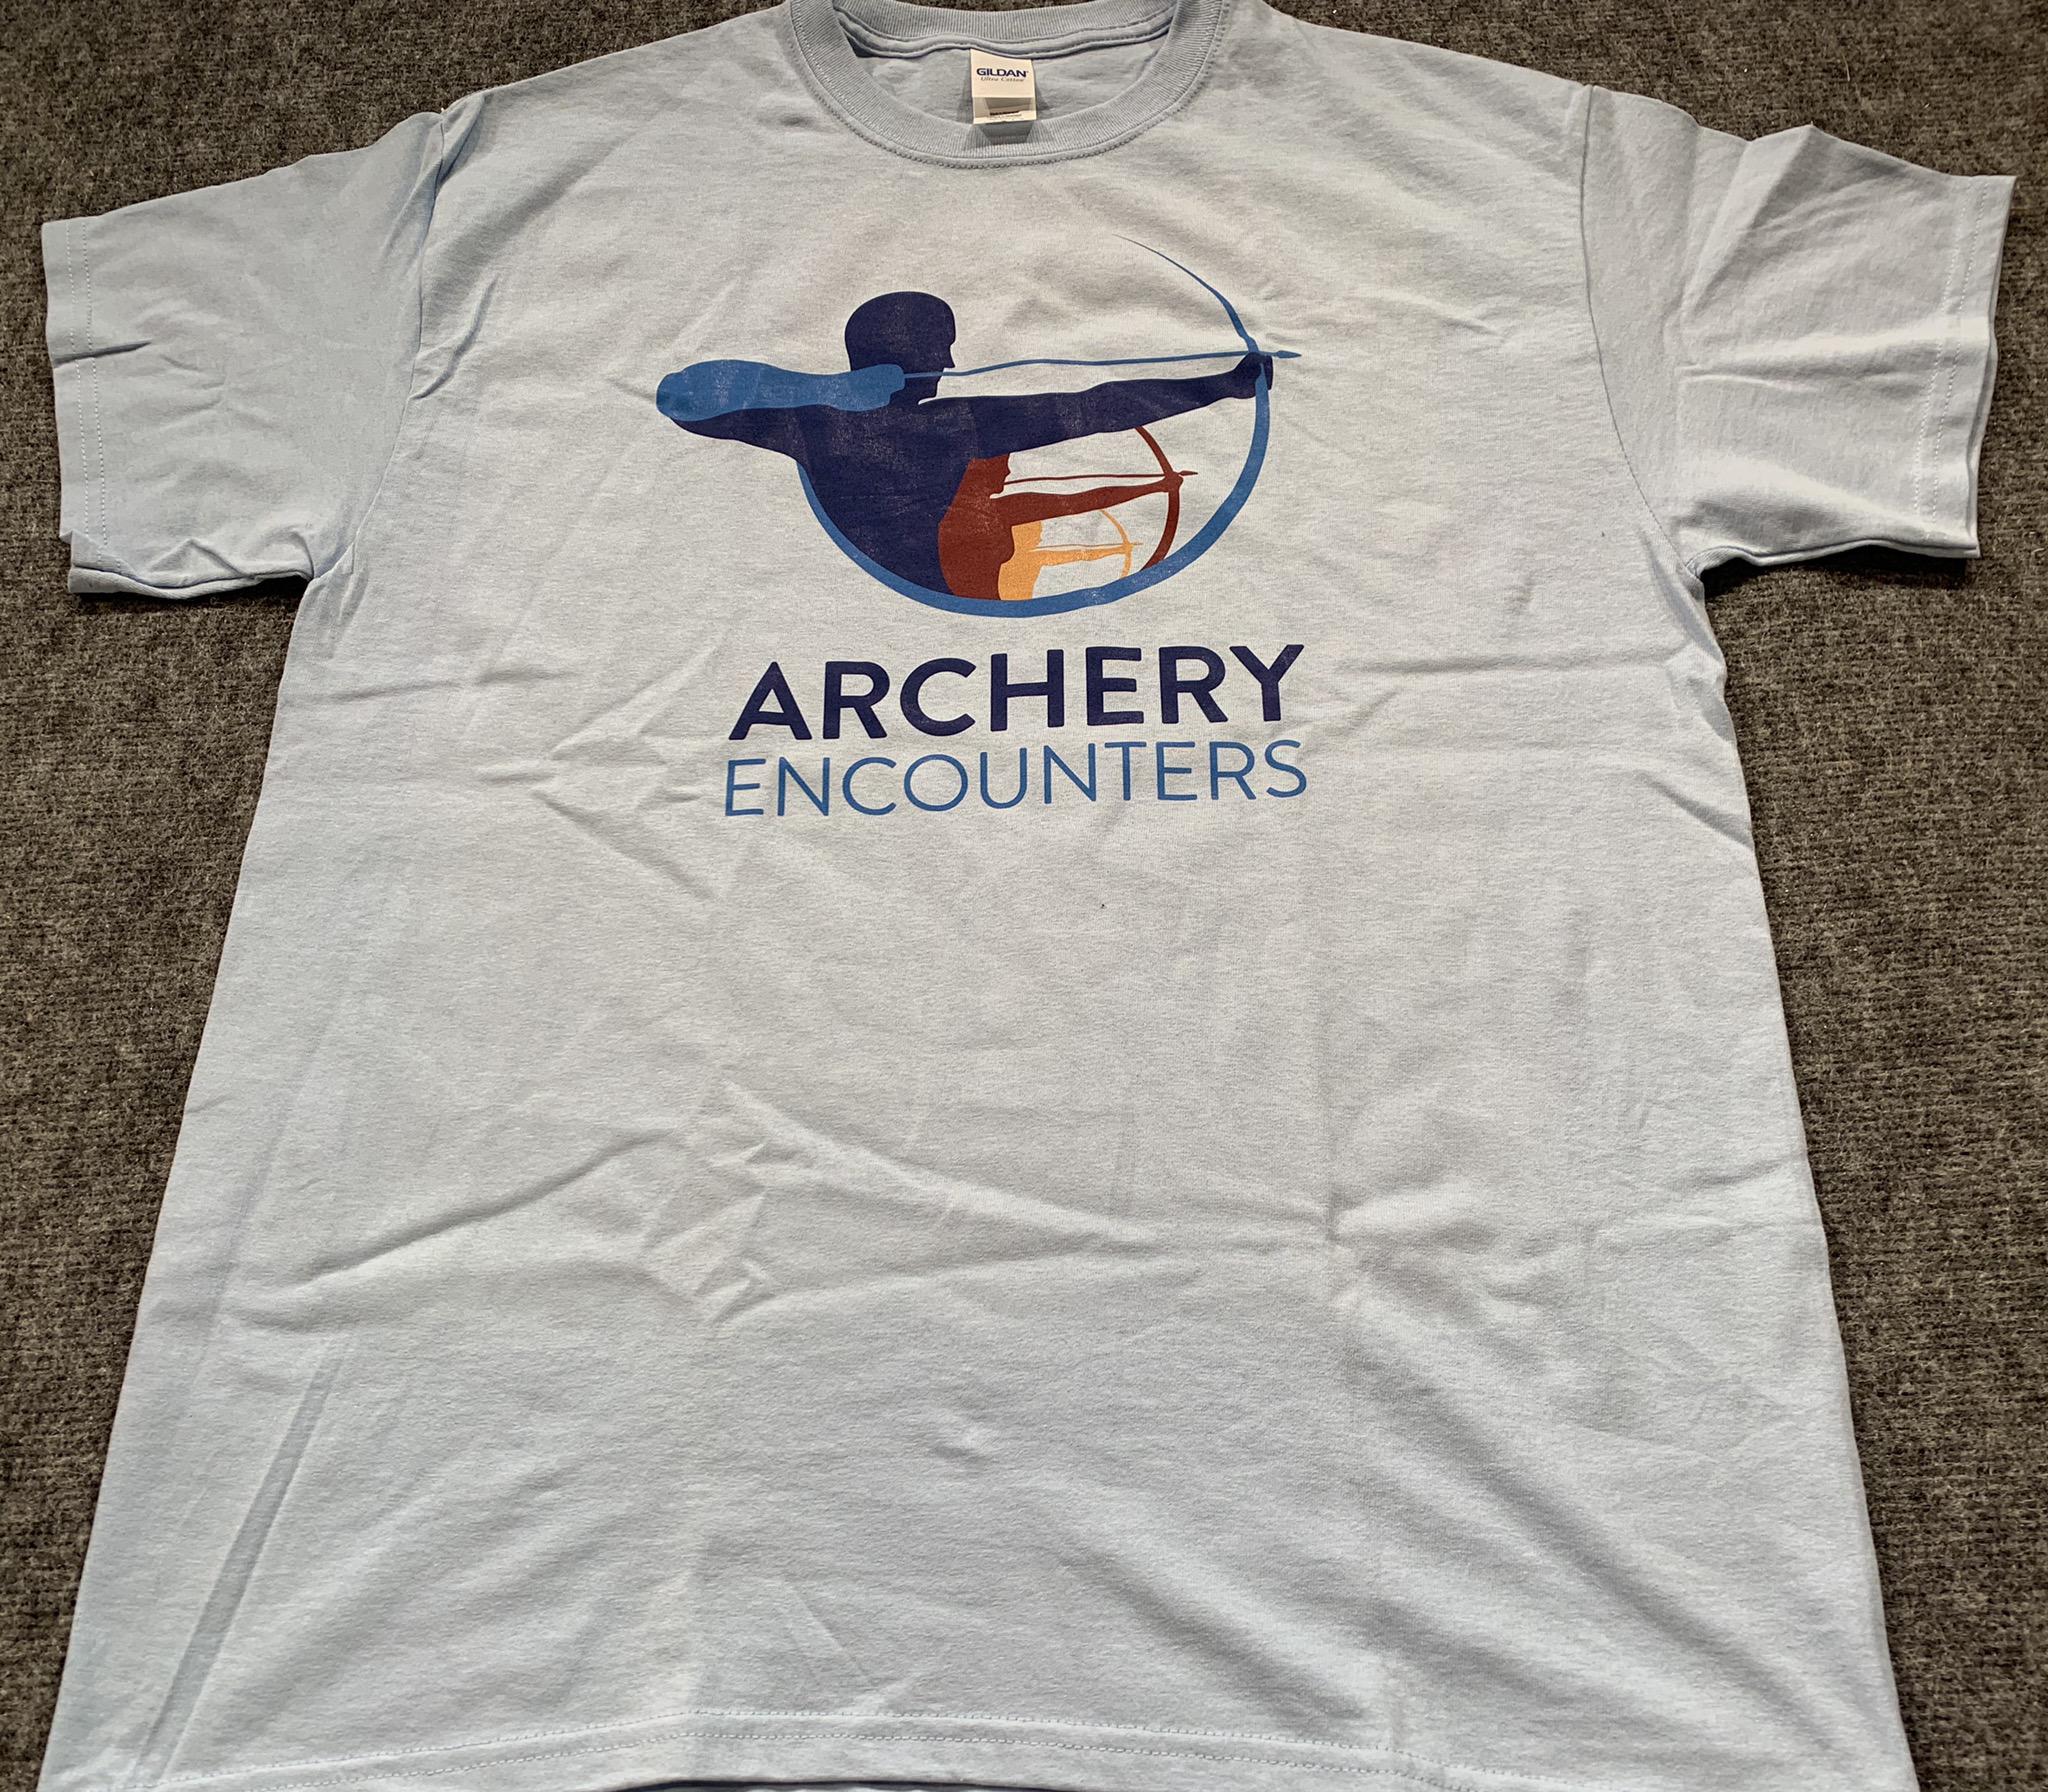 T-shirt Order  00033